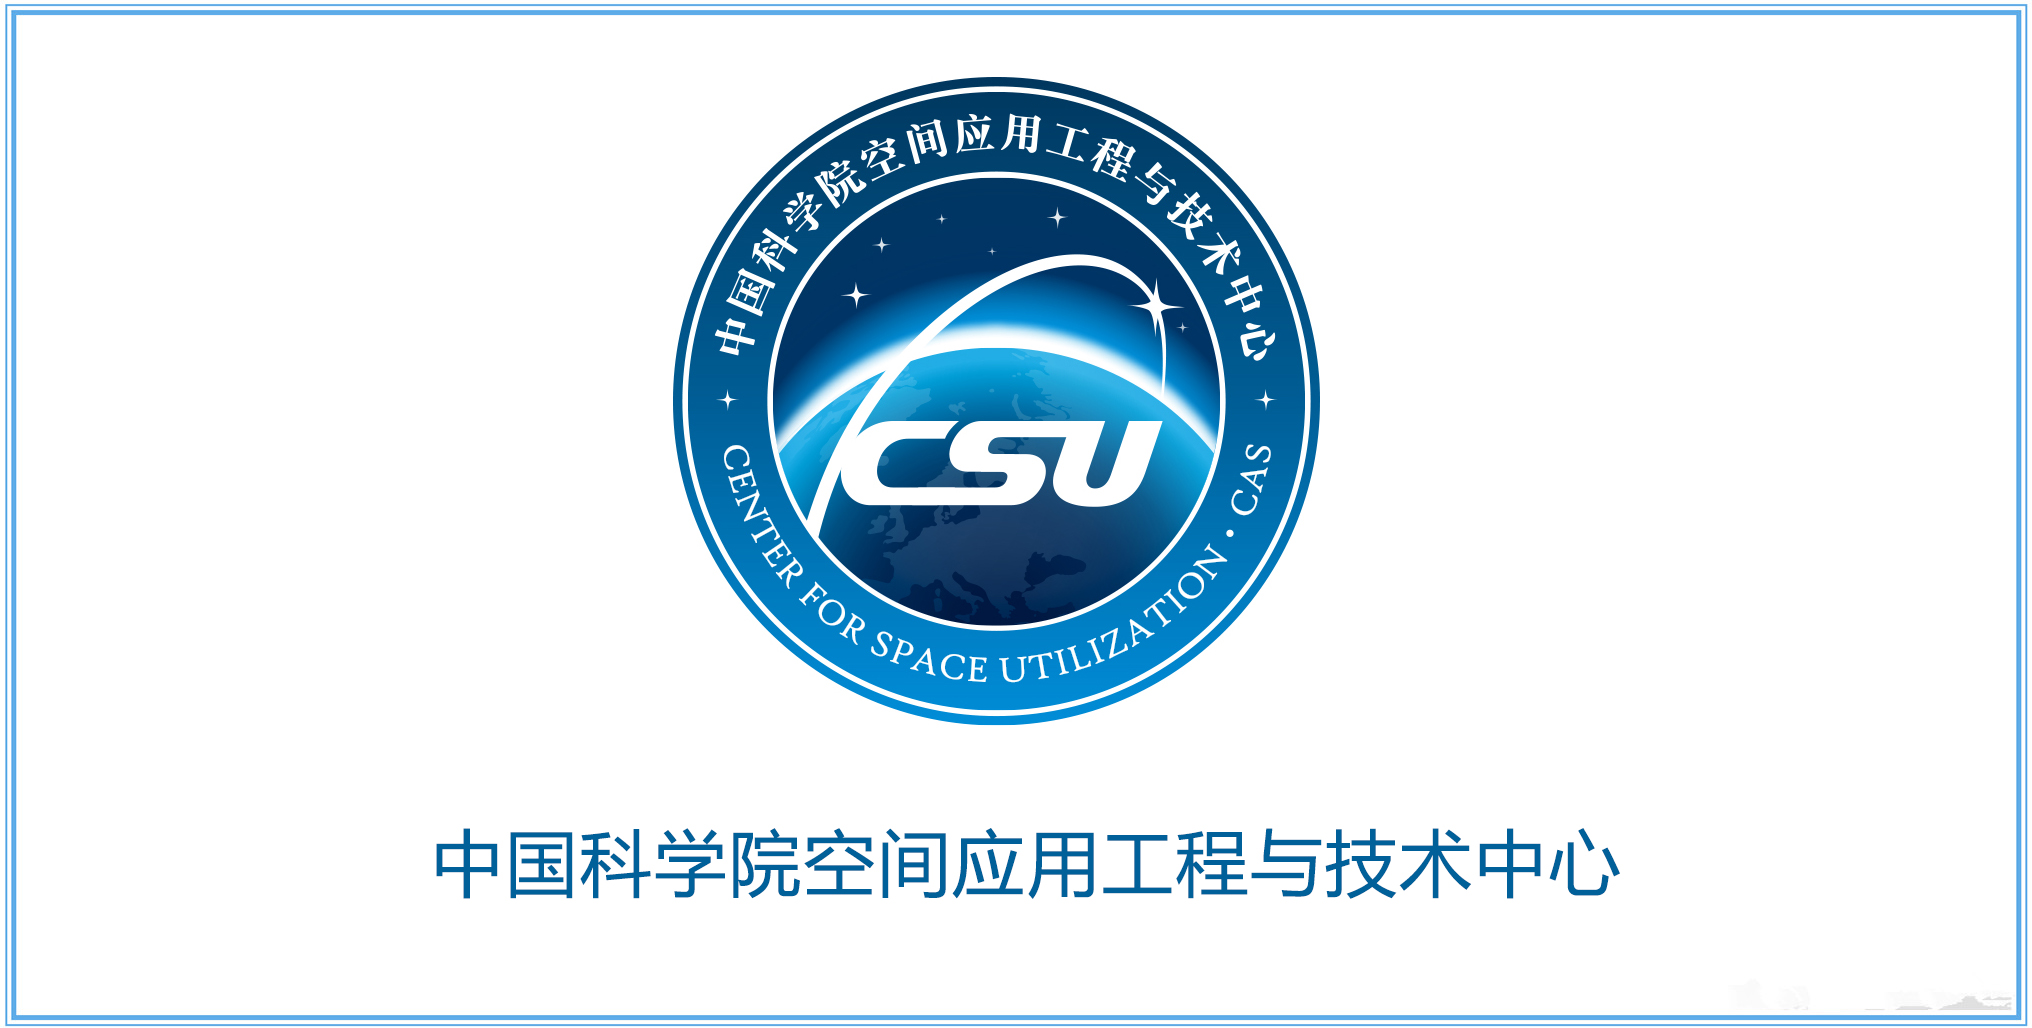 "<div style=""text-align:center;""> 中國科學院 </div>"